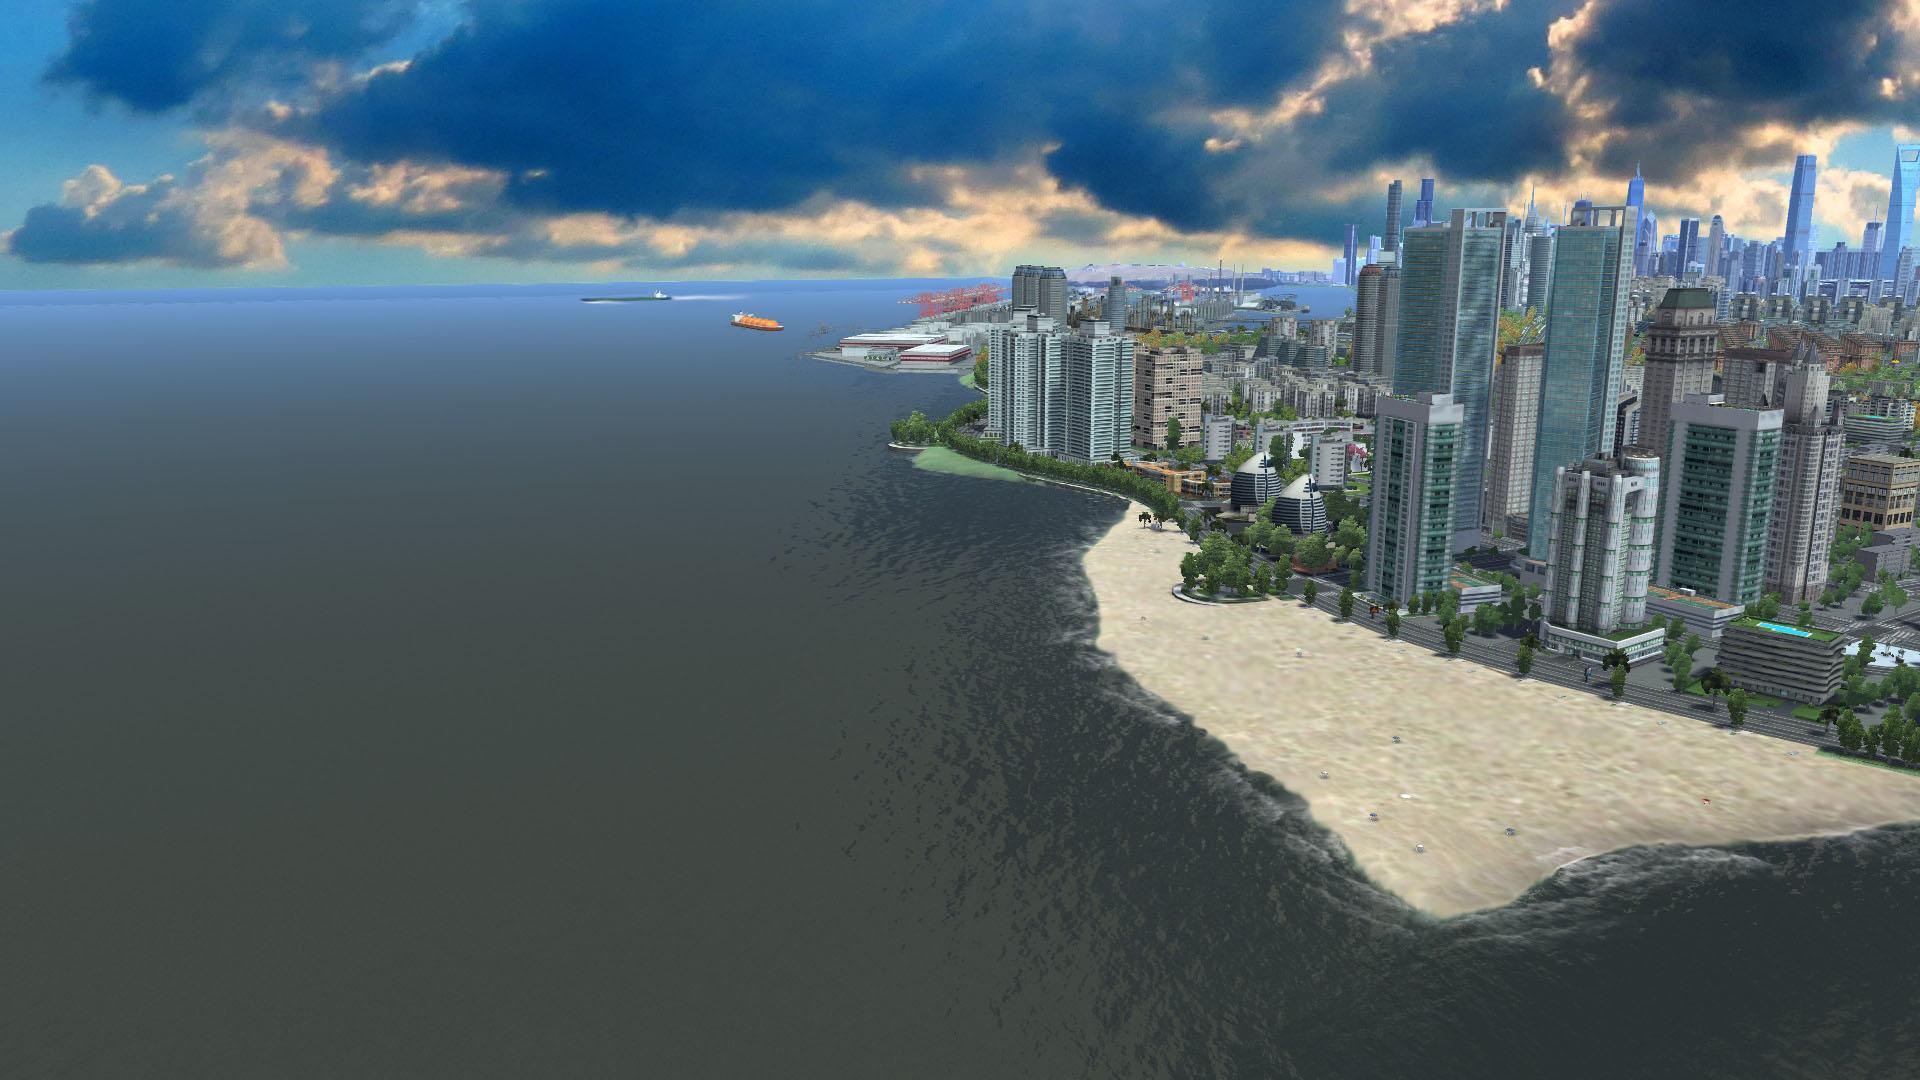 Puerto Bahía-playas 03b.jpg